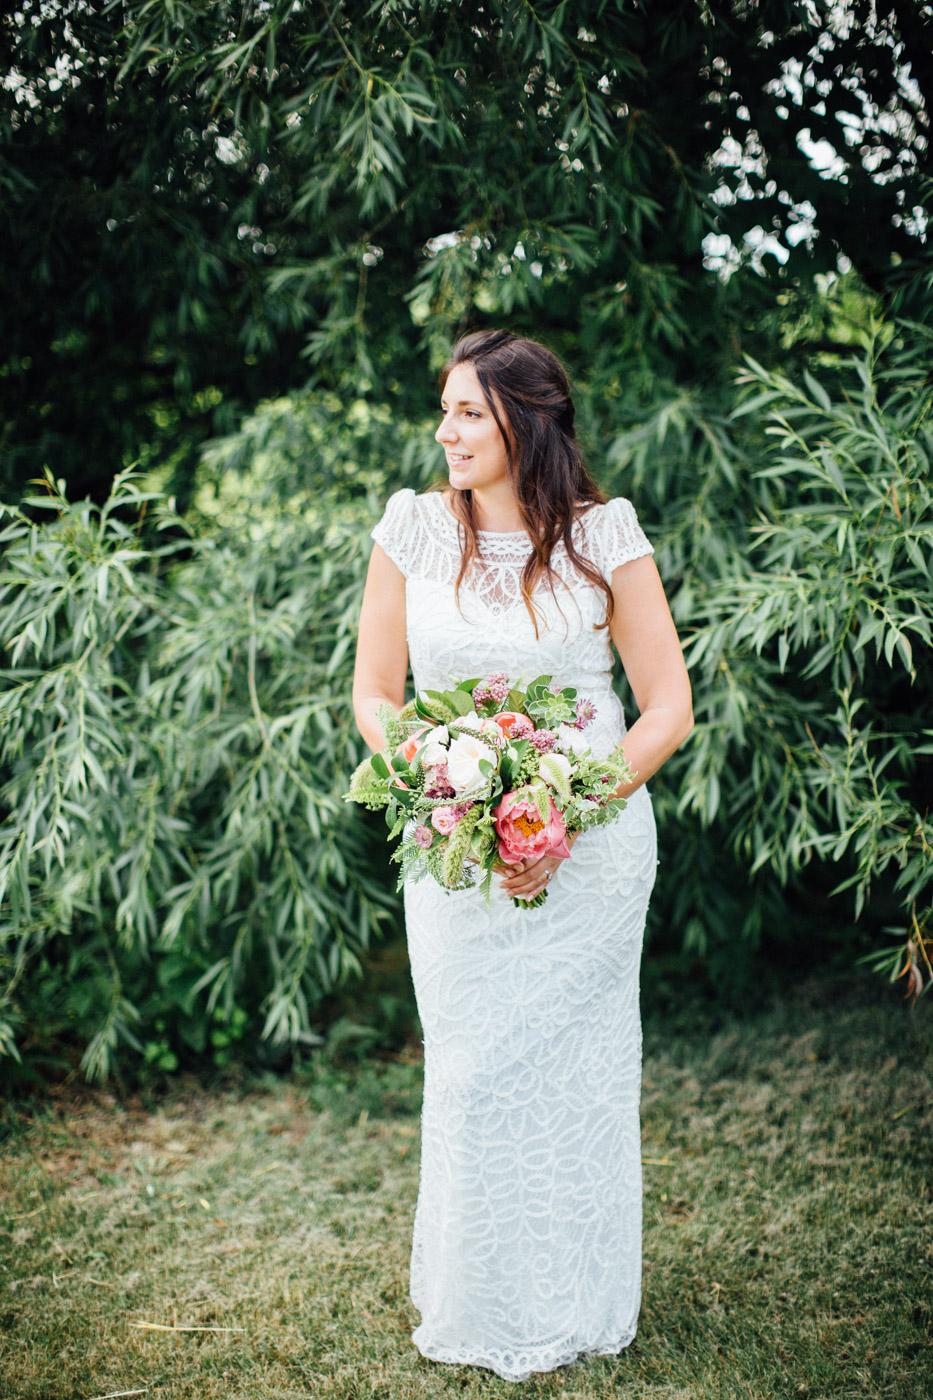 Thera & Barry Wedding 2016-302.jpg